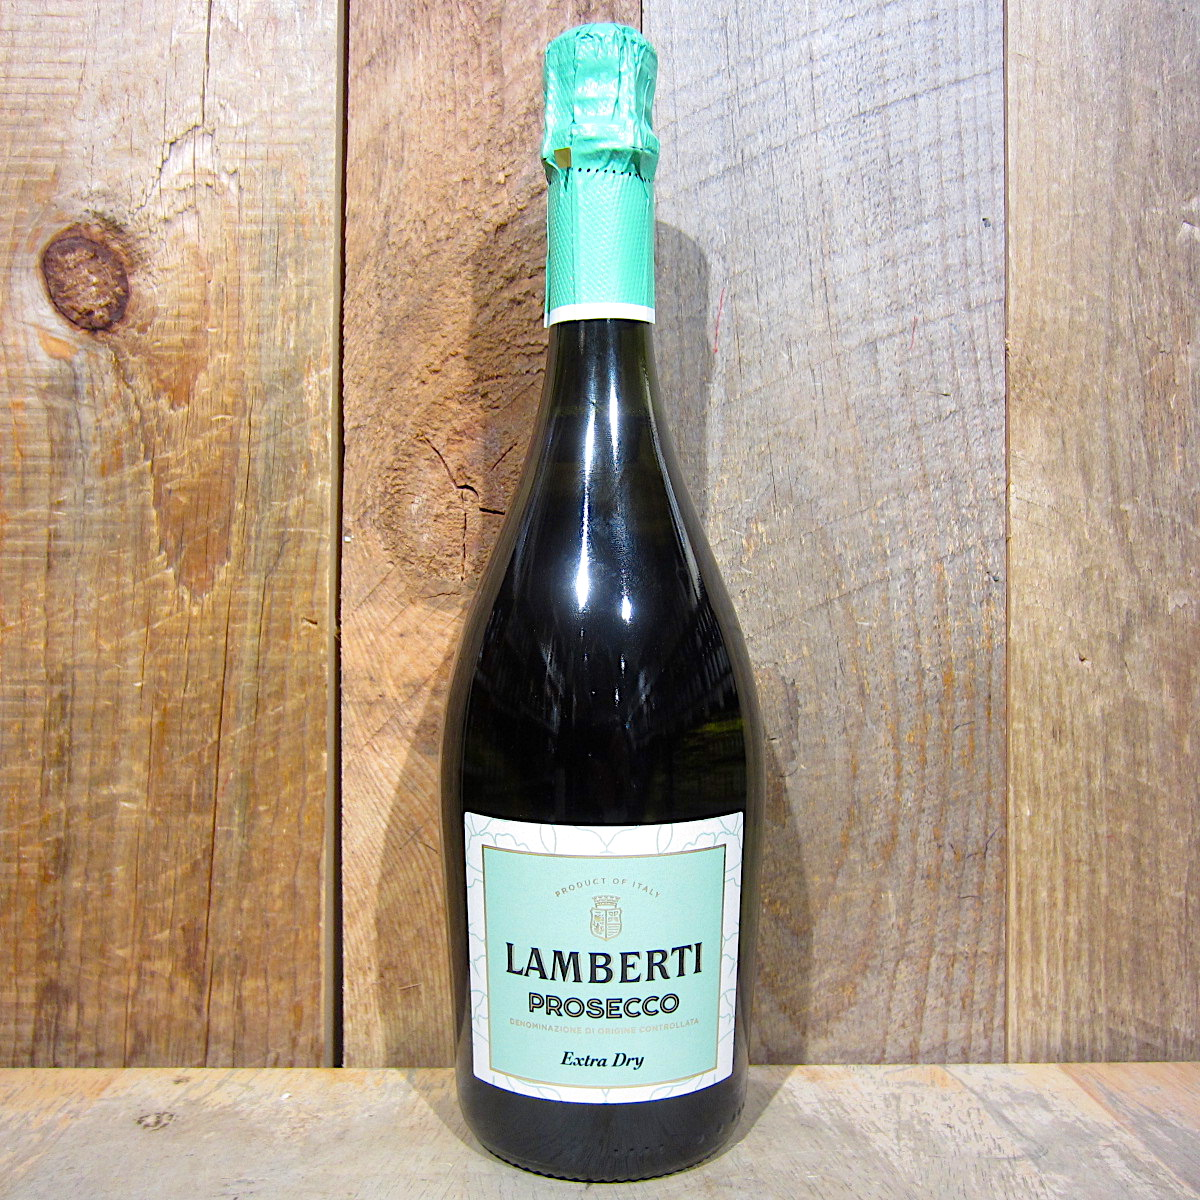 Lamberti Prosecco 750ml